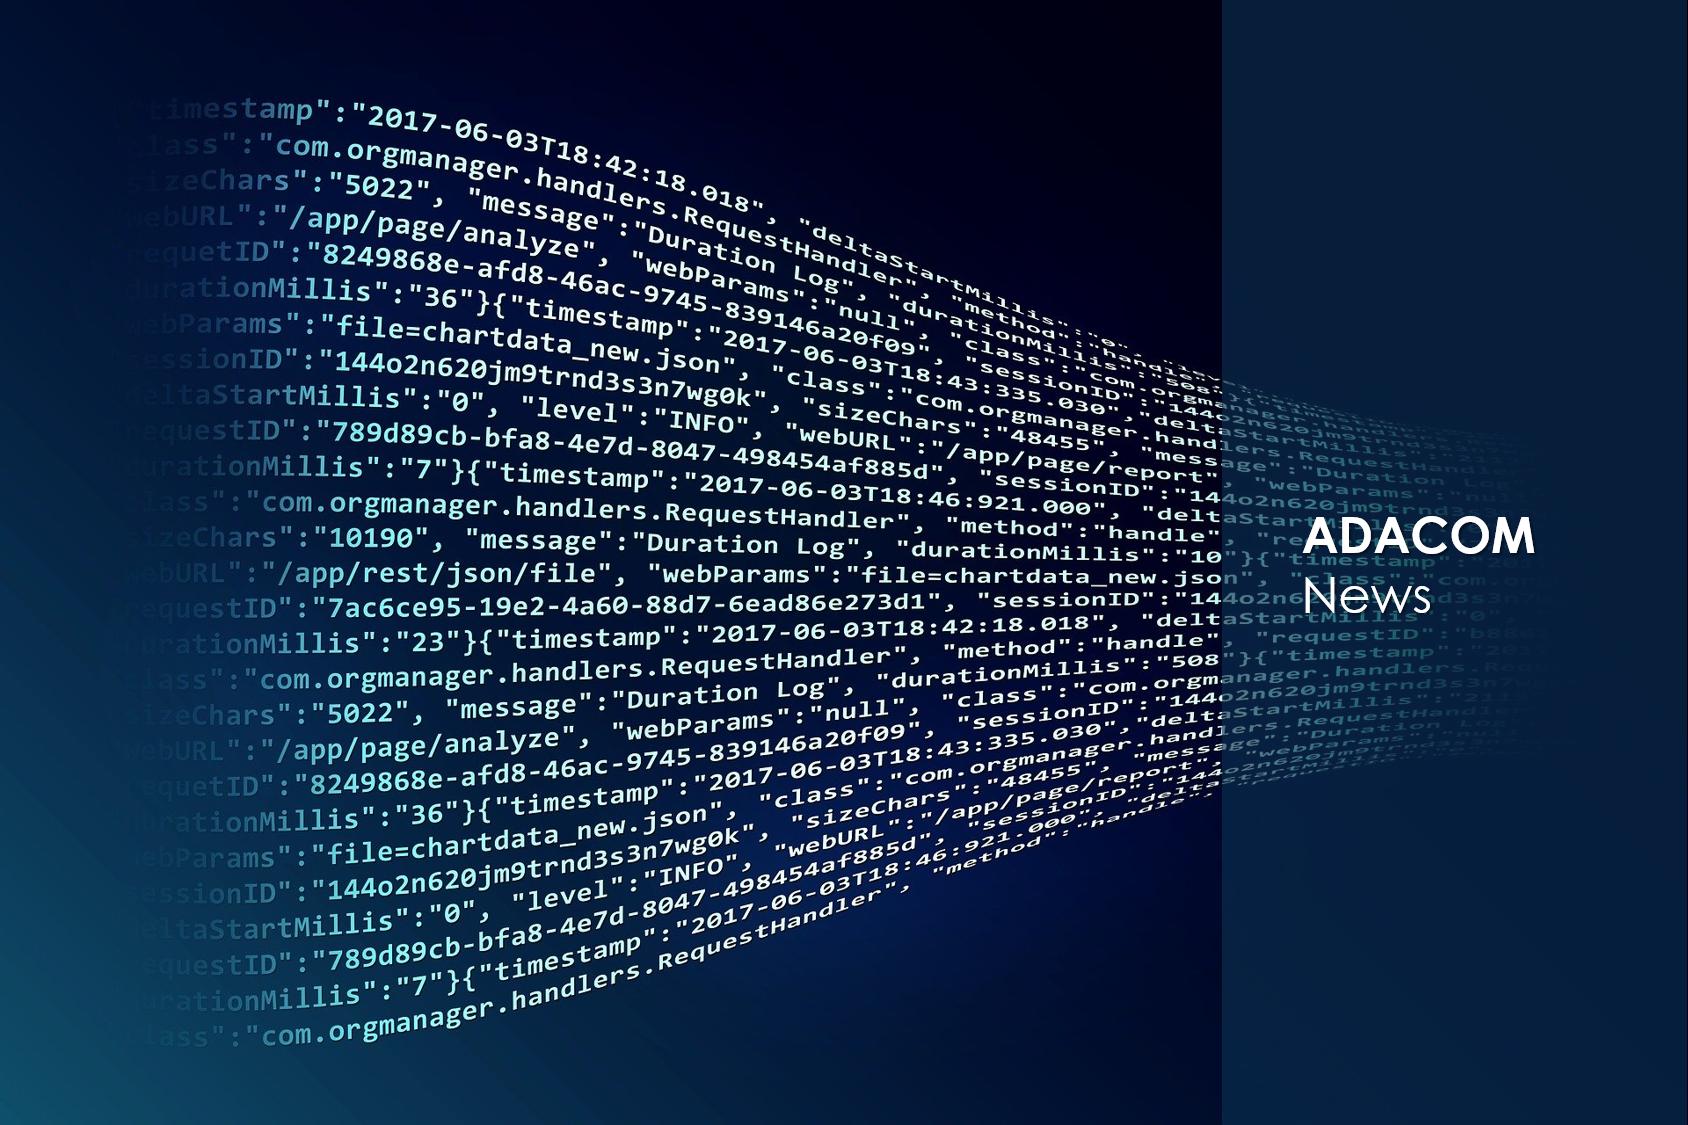 adacom news generic1